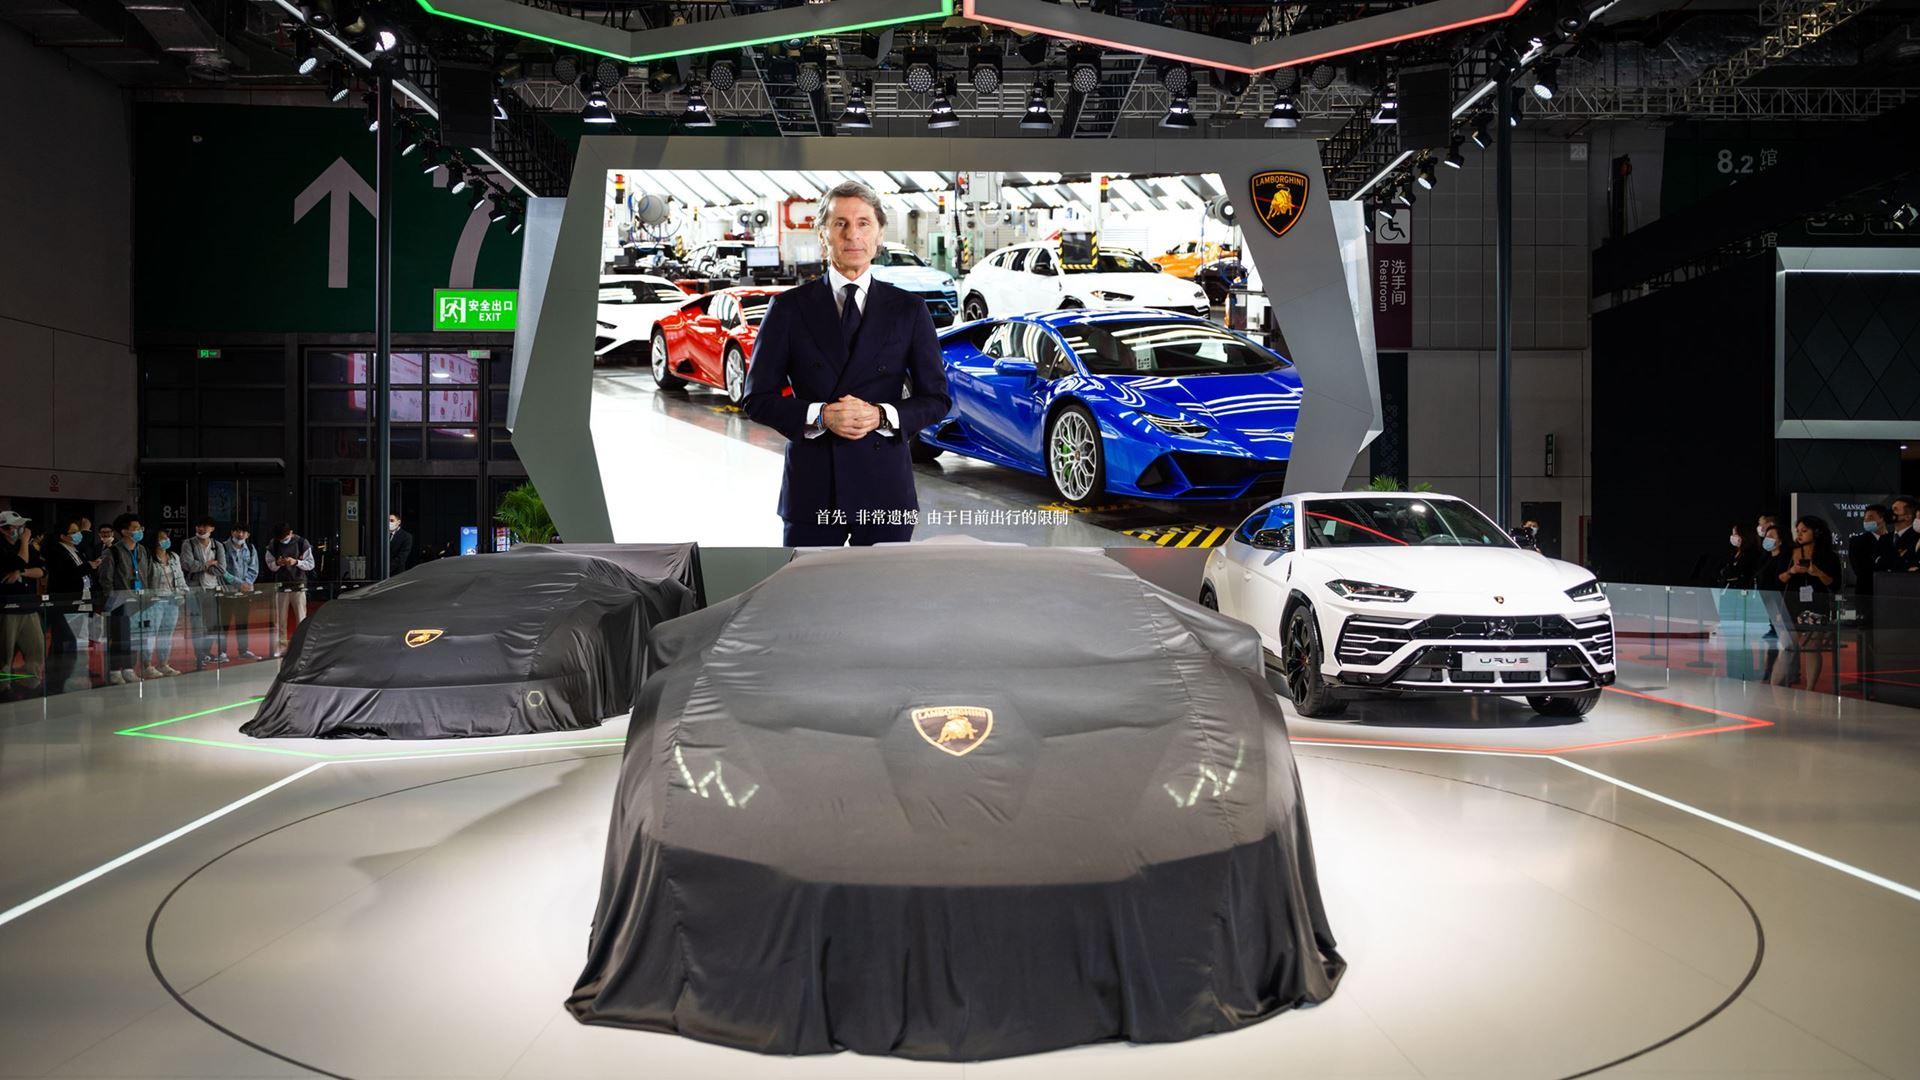 Three premieres for Automobili Lamborghini at the 2021 Shanghai Auto Show - Image 7